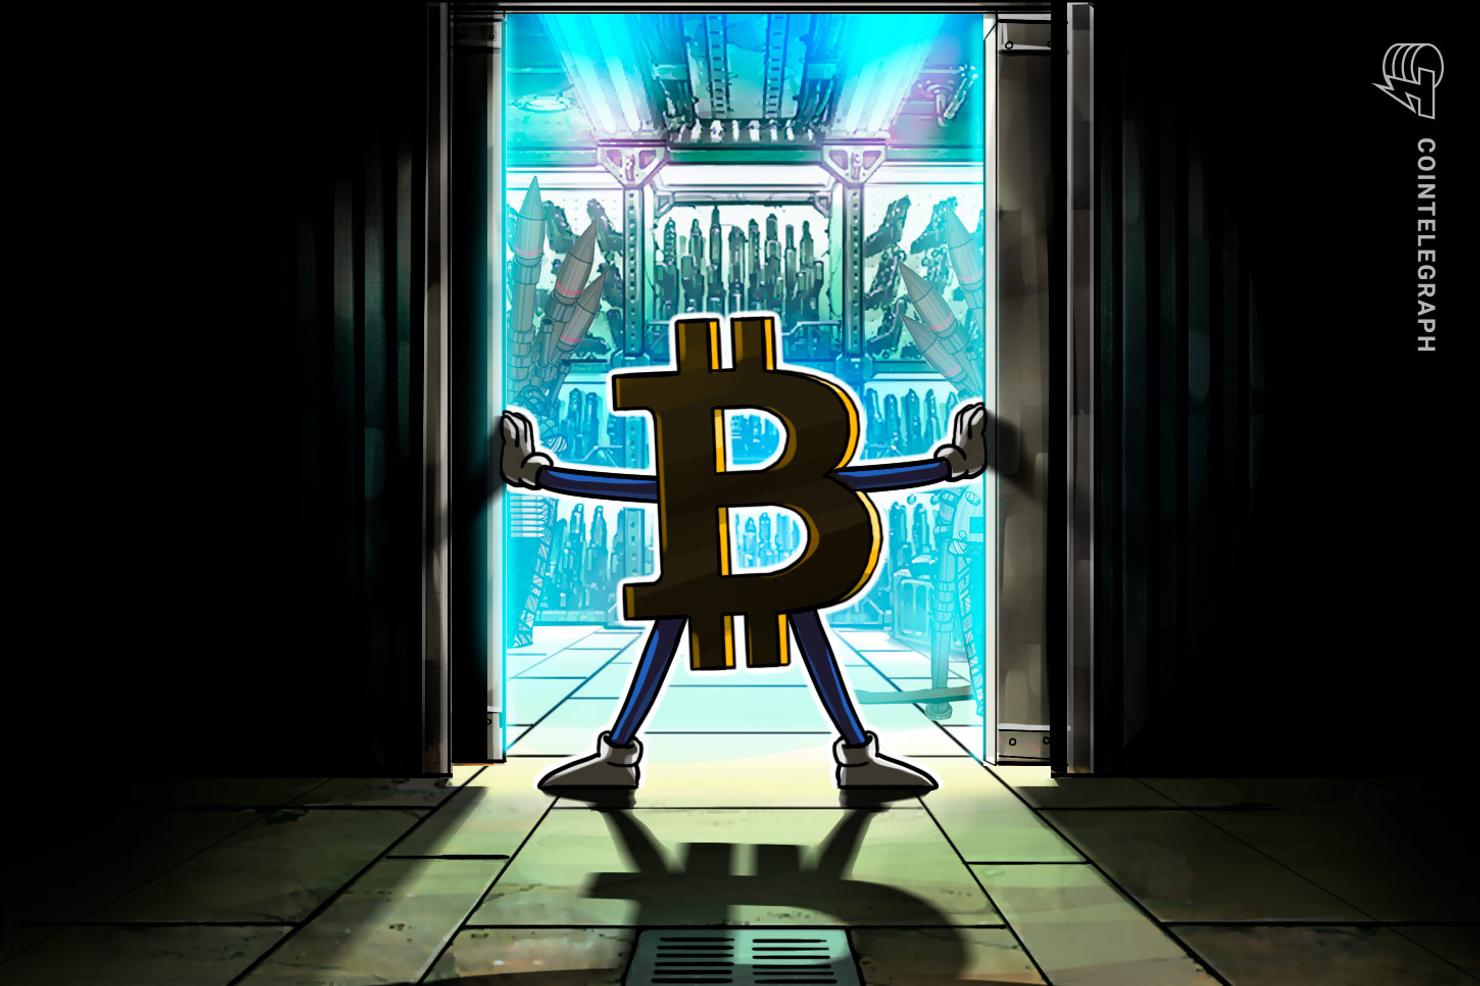 Suberg bitcoin price makes